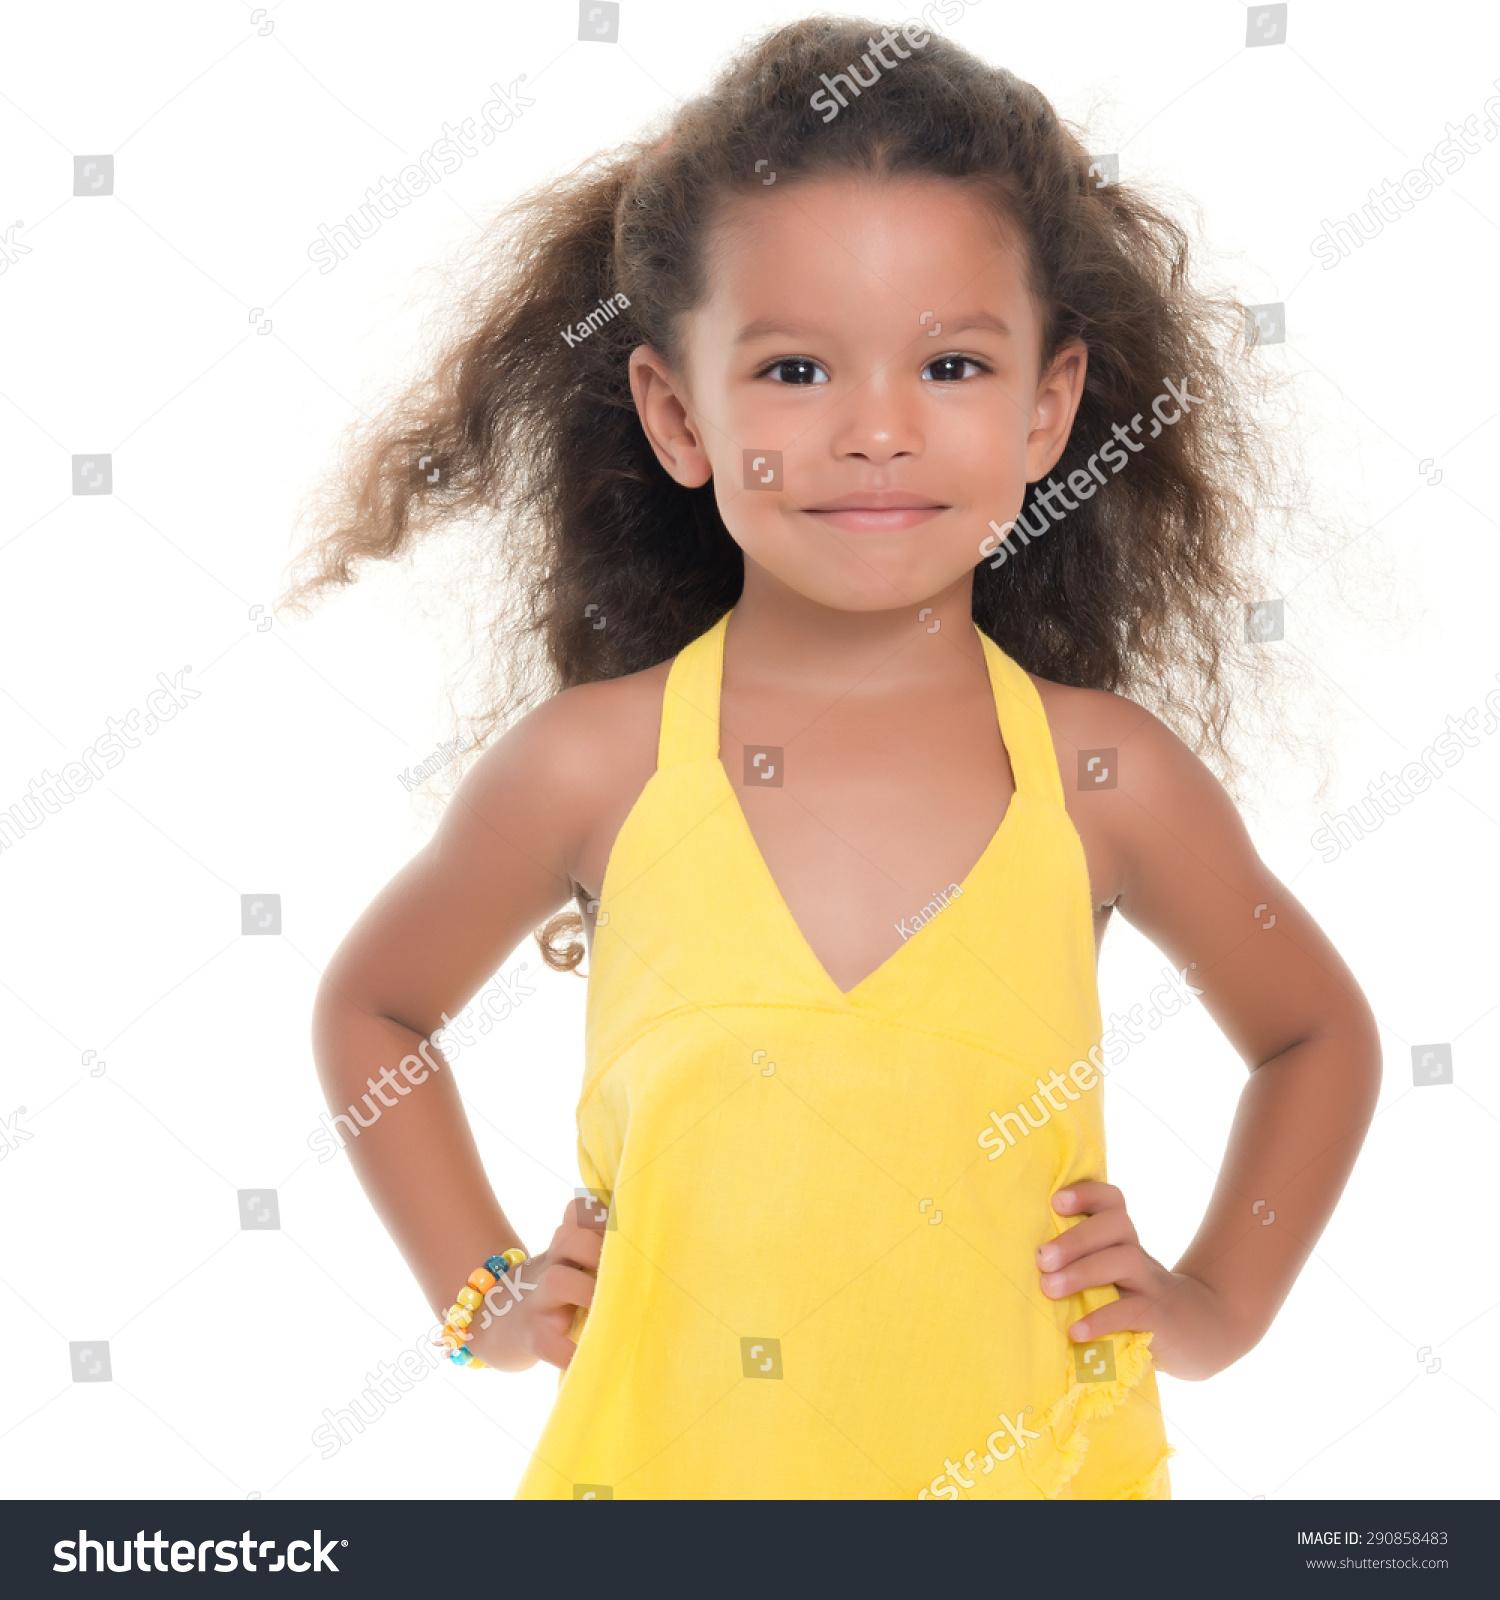 yellowtail single hispanic girls Single latin women photo see single latin women latin ladies latin girls tlc worldwide, inc publishes the most beautiful single latin women in the.